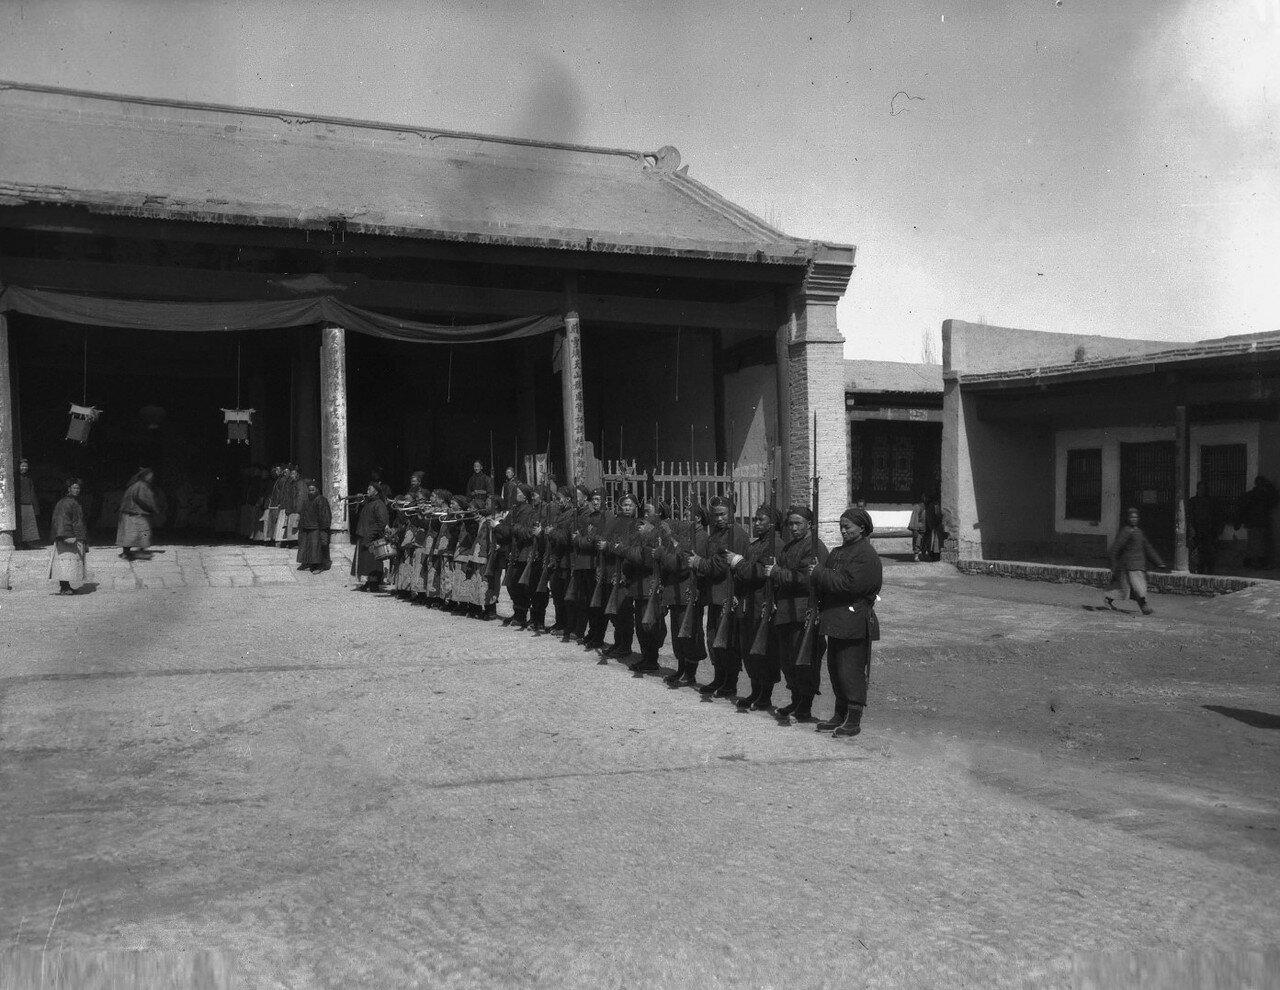 Почетный караул во дворе даотана во время визита Маннергейма